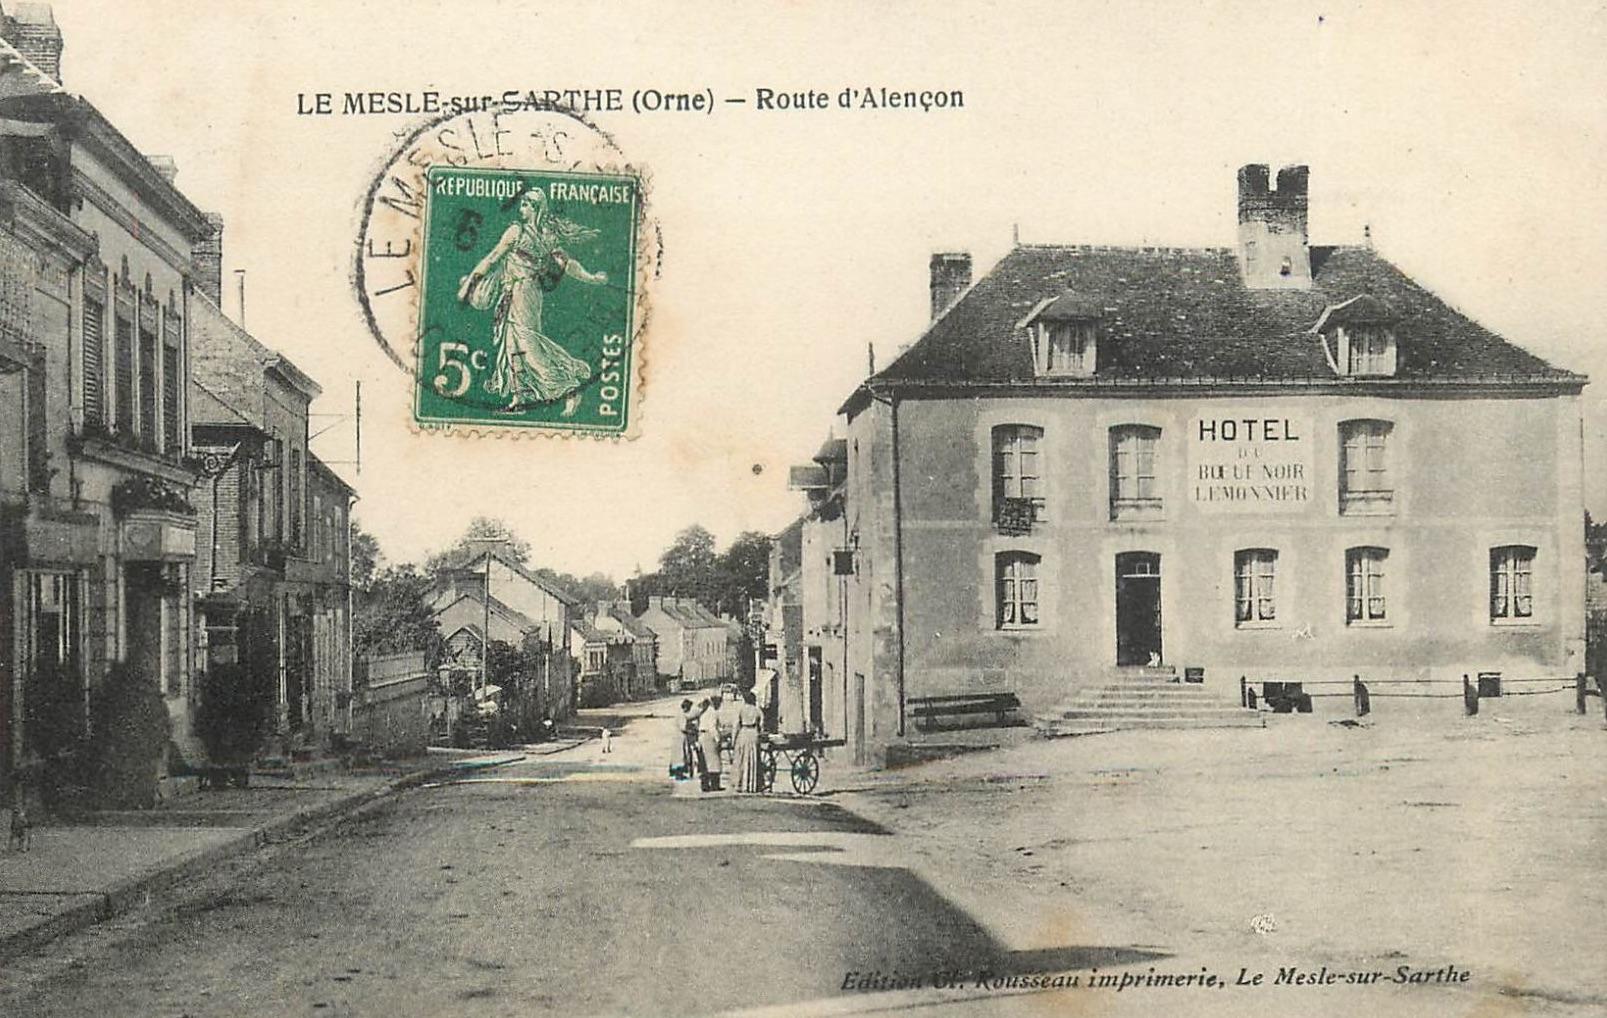 Boeuf-noir-lemonnier